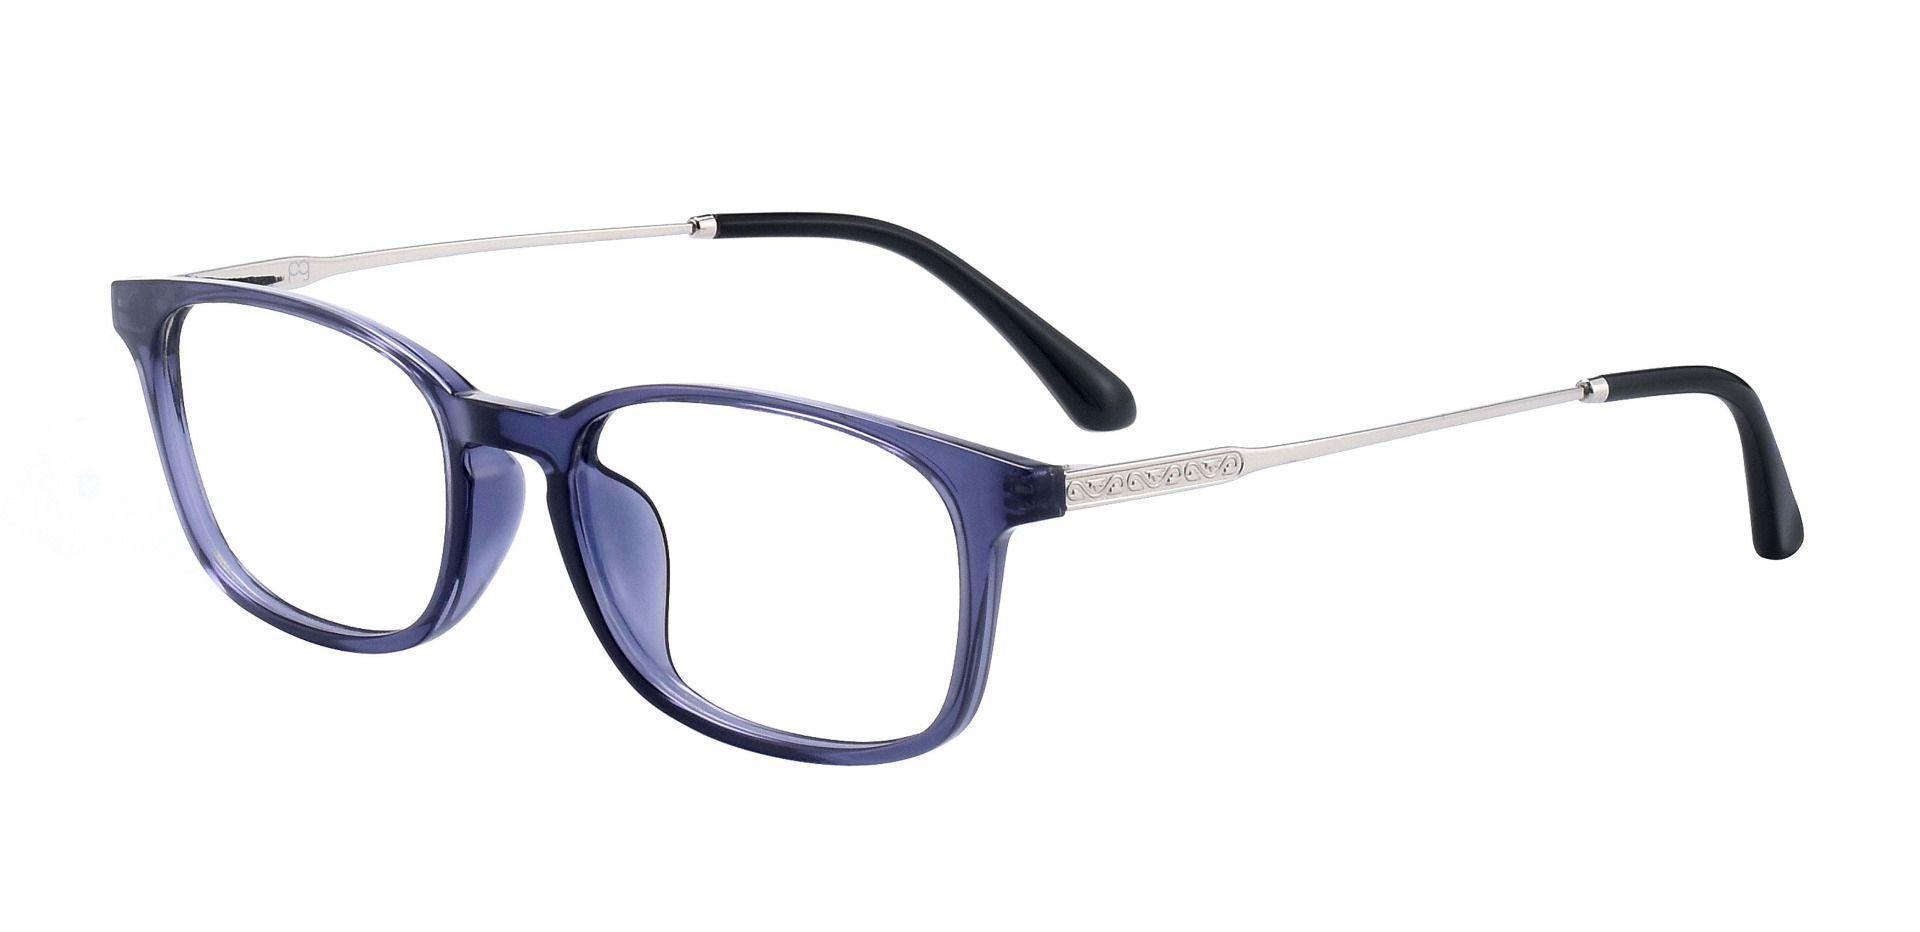 Vanna Rectangle Prescription Glasses - Blue